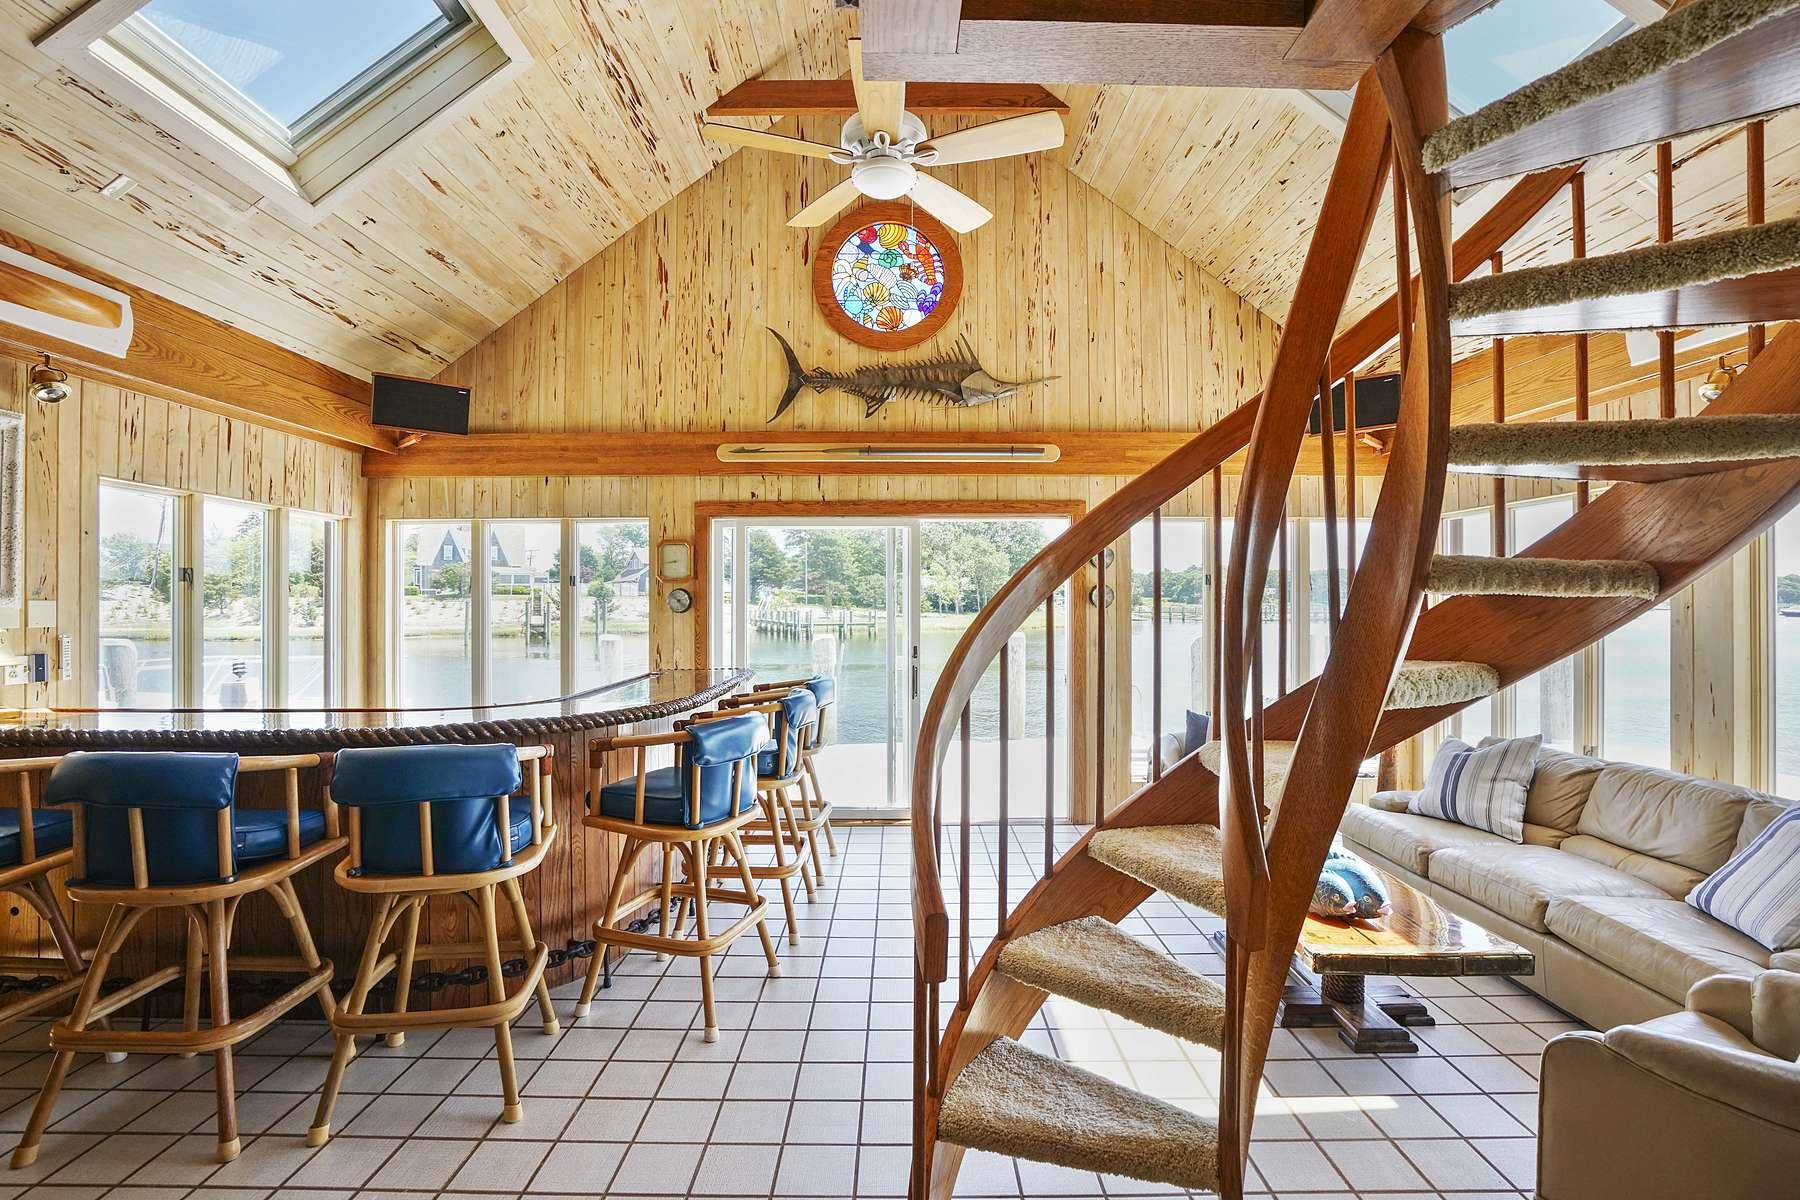 Additional photo for property listing at 227 Bridge Street Osterville, Massachusetts 02655 Estados Unidos